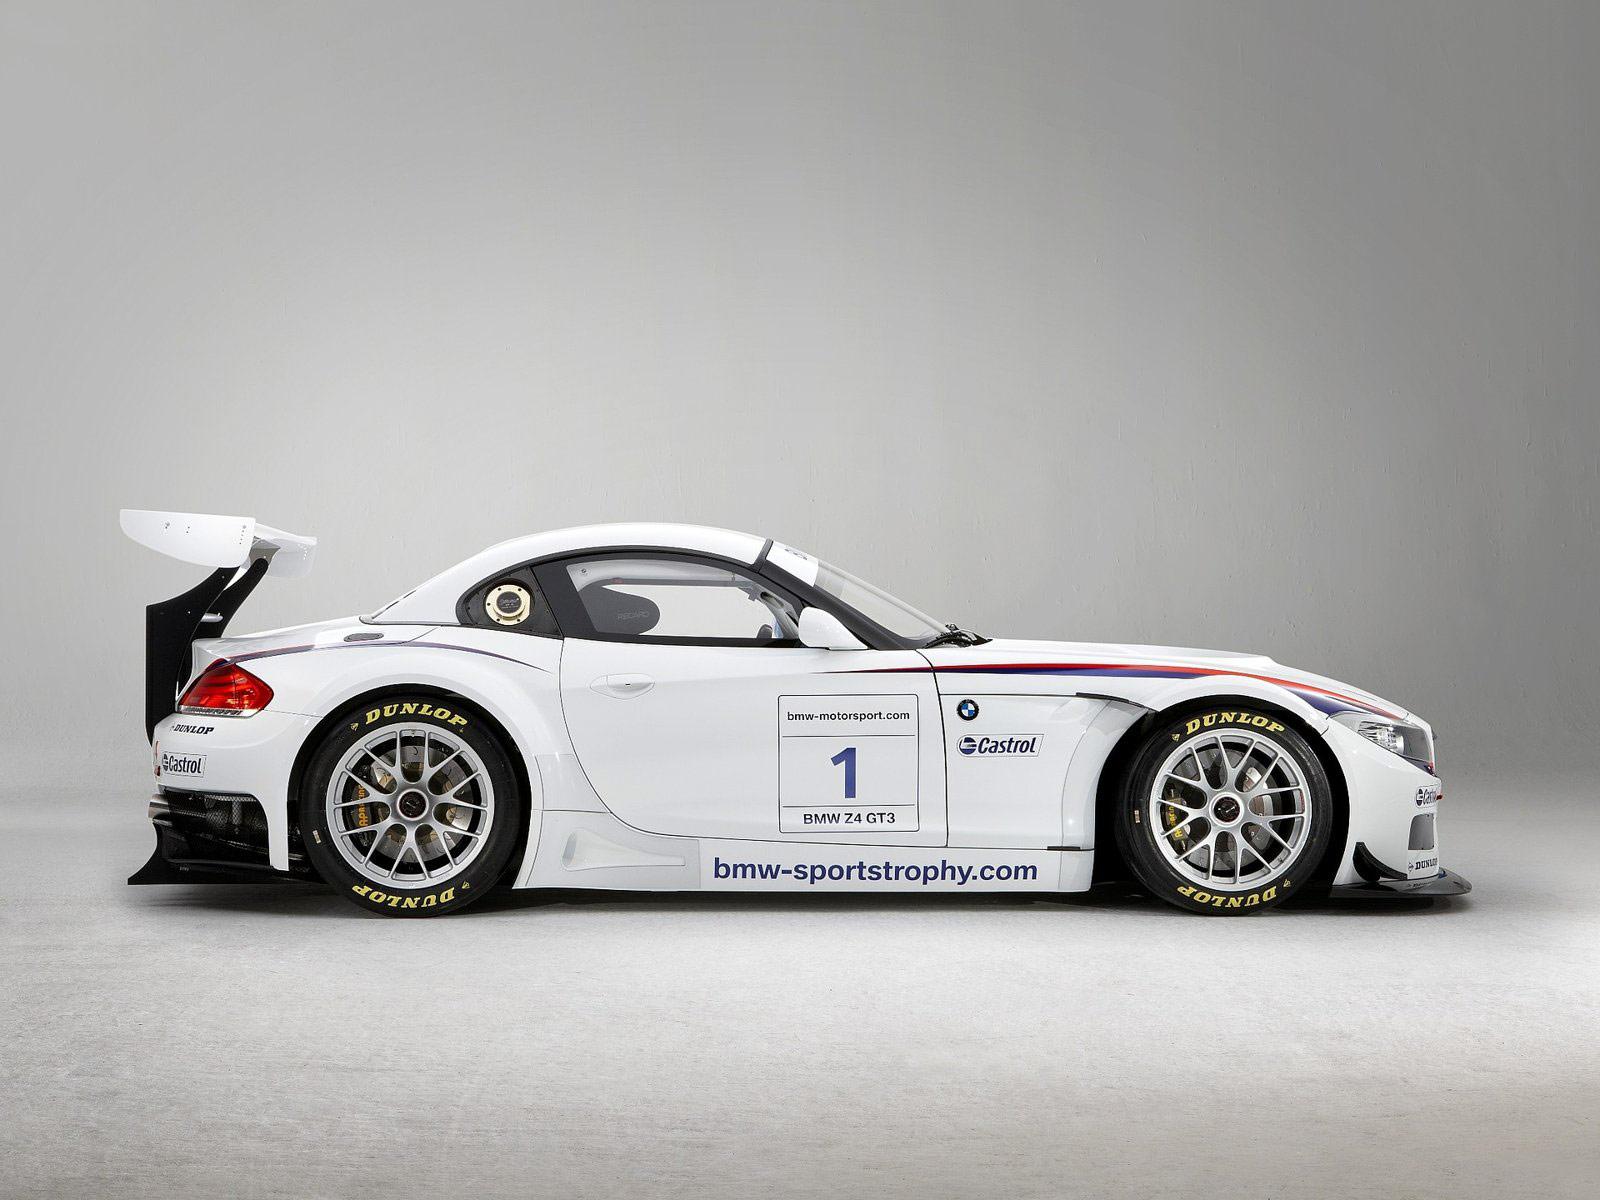 2010 BMW Z4GT3 car accident lawyers info, desktop wallpapers